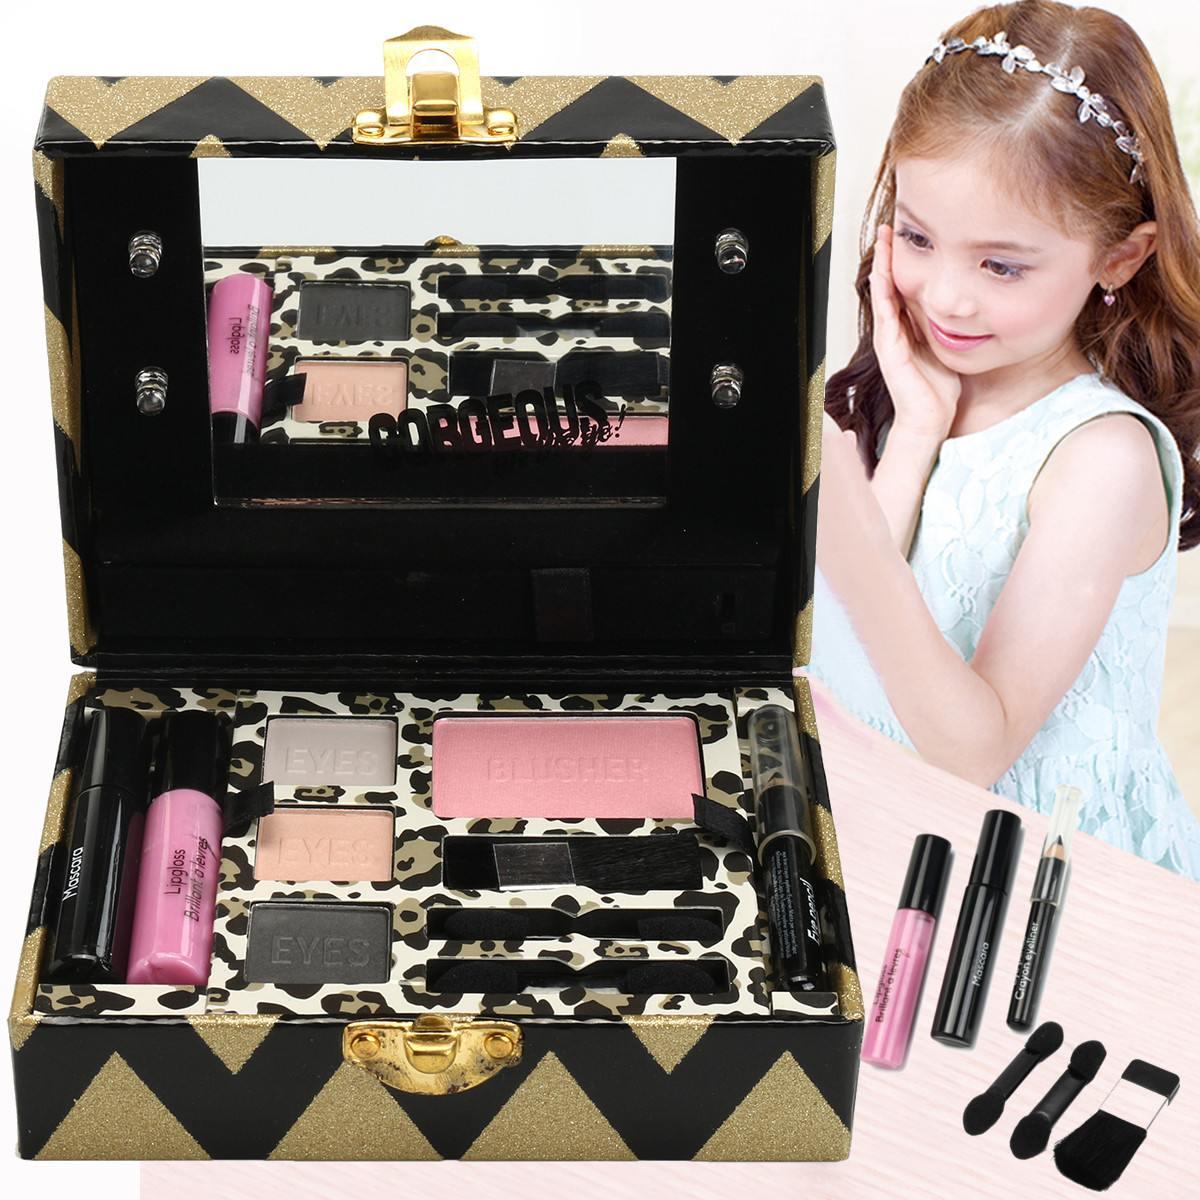 Kids Makeup Palette Set Princess Girl's Glitter Pretend Play Toy Eyeshadow Blush Lipgloss Brush Light Mirror Cosmetic Toy Kit